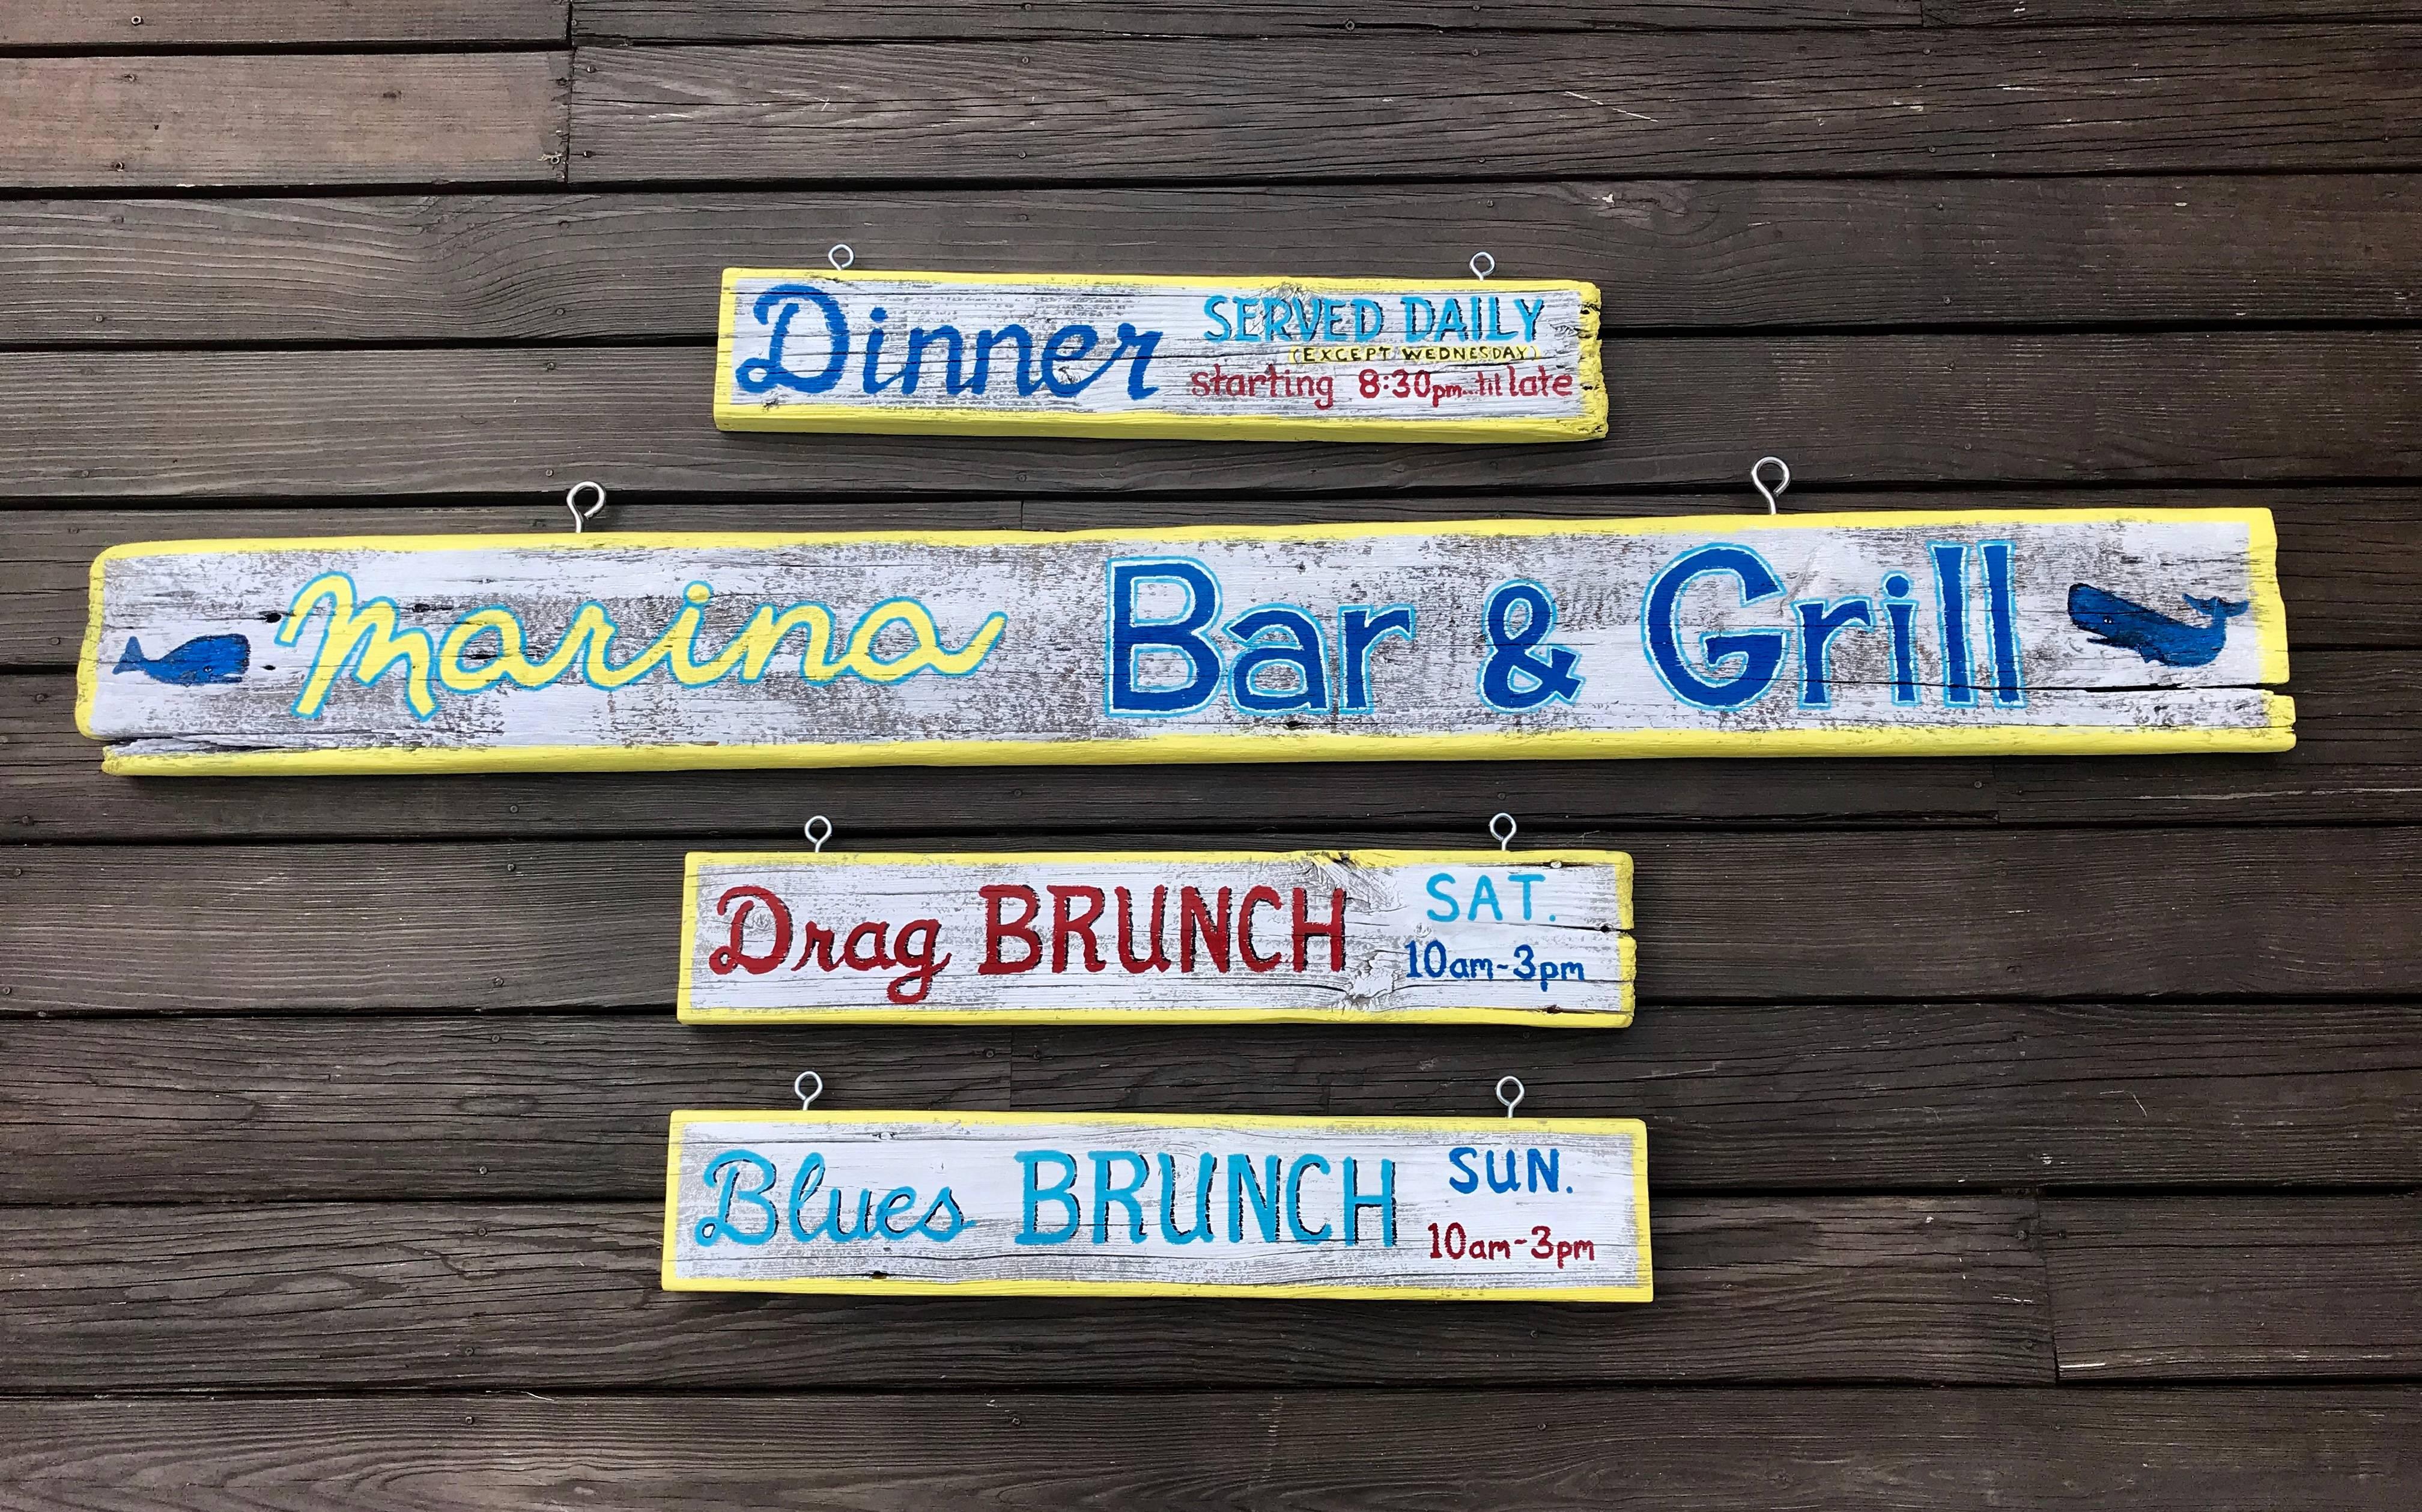 Restaurant front sign